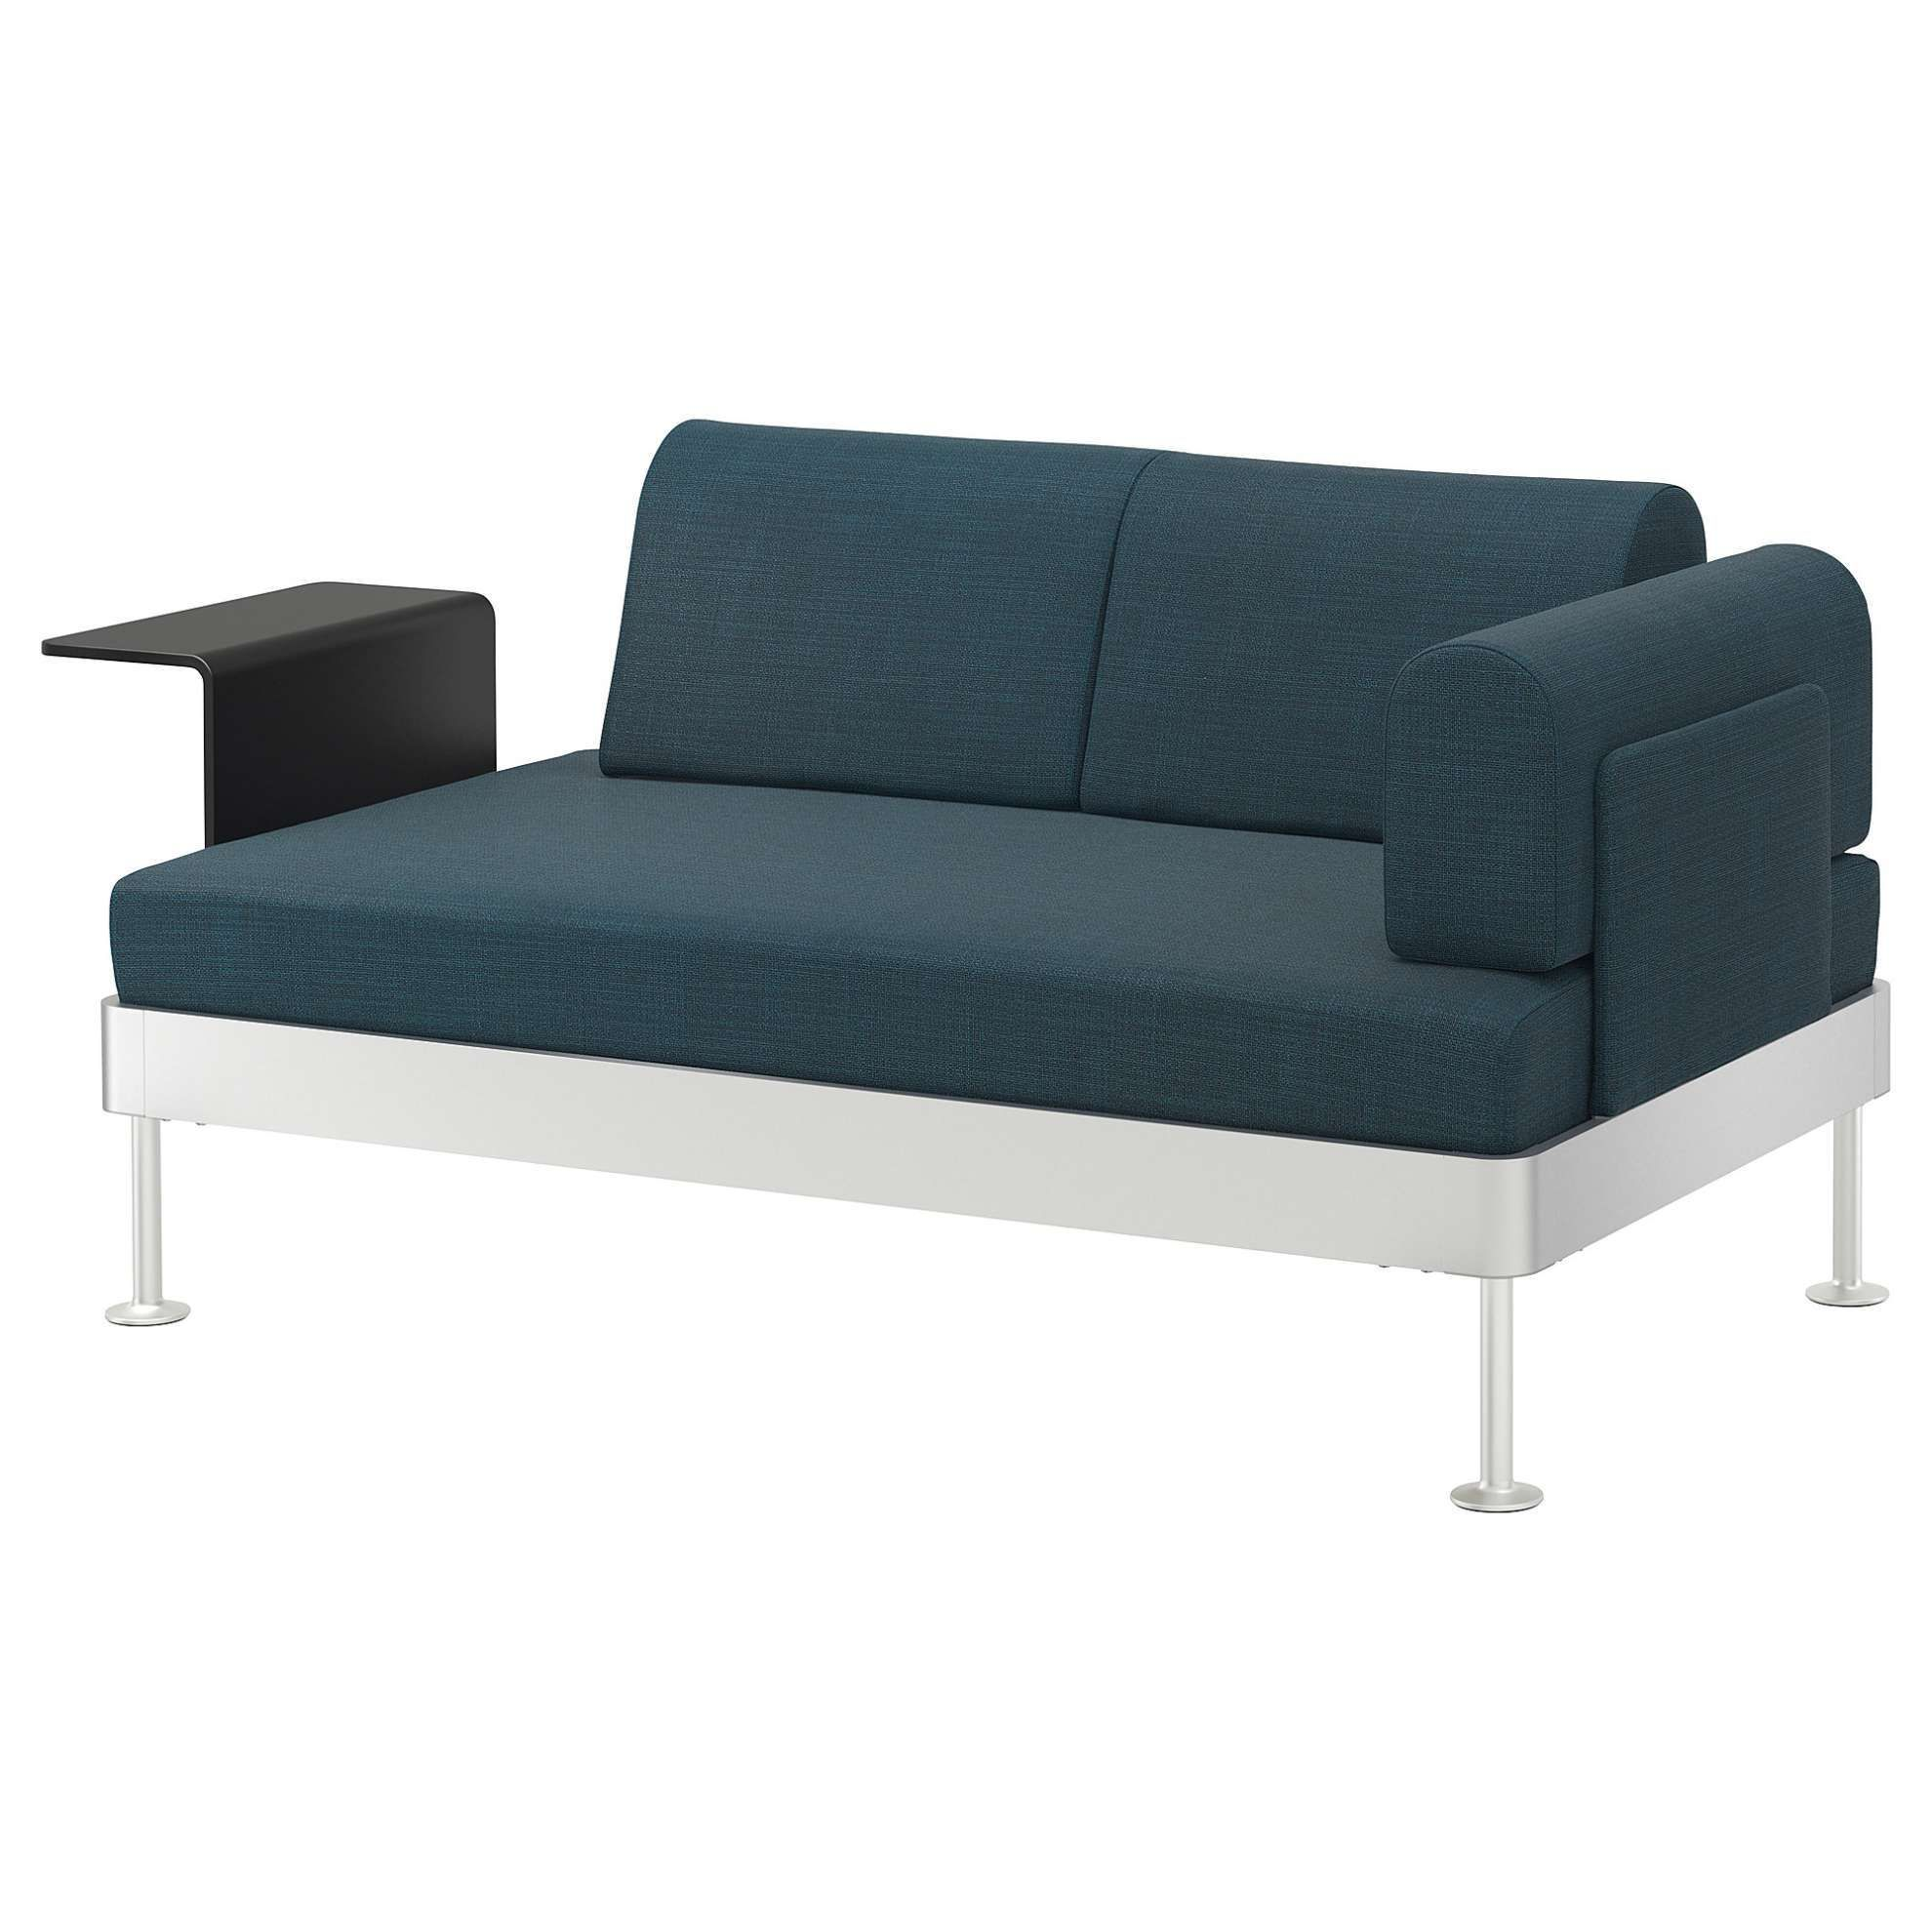 29 Fresh Vintage 2 Sitzer Sofa 2er Sofa 3er Sofa 2 Sitzer Sofa